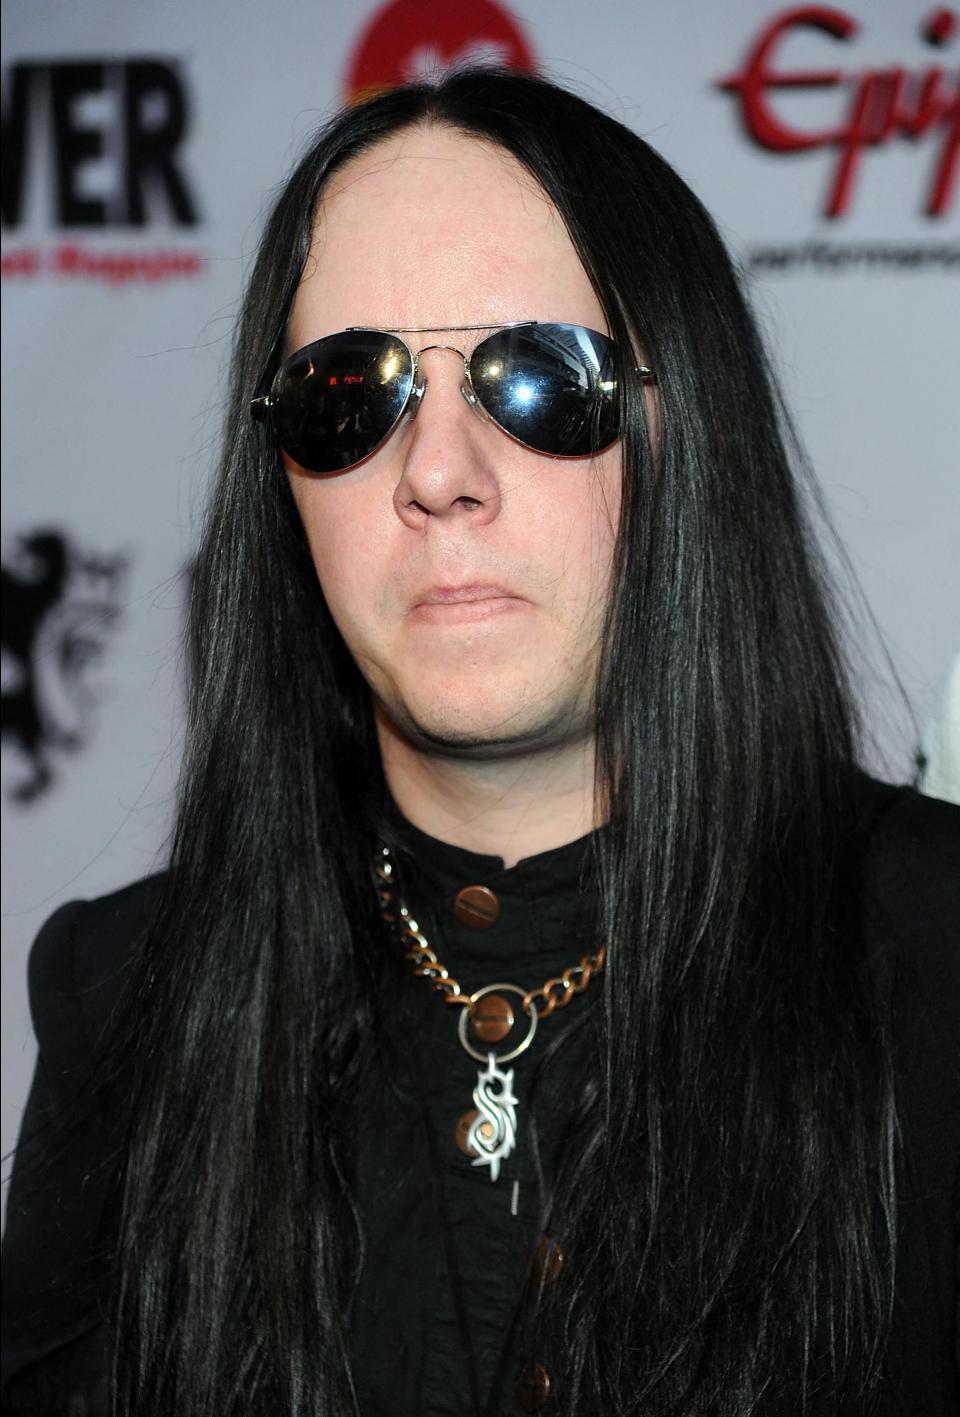 Musician Joey Jordison of Slipknot arriving at the Revolver Golden Gods Awards held at Club Nokia on April 8, 2010 in Los Angeles, California. Photo: Frazer Harrison/Getty Images via AFP